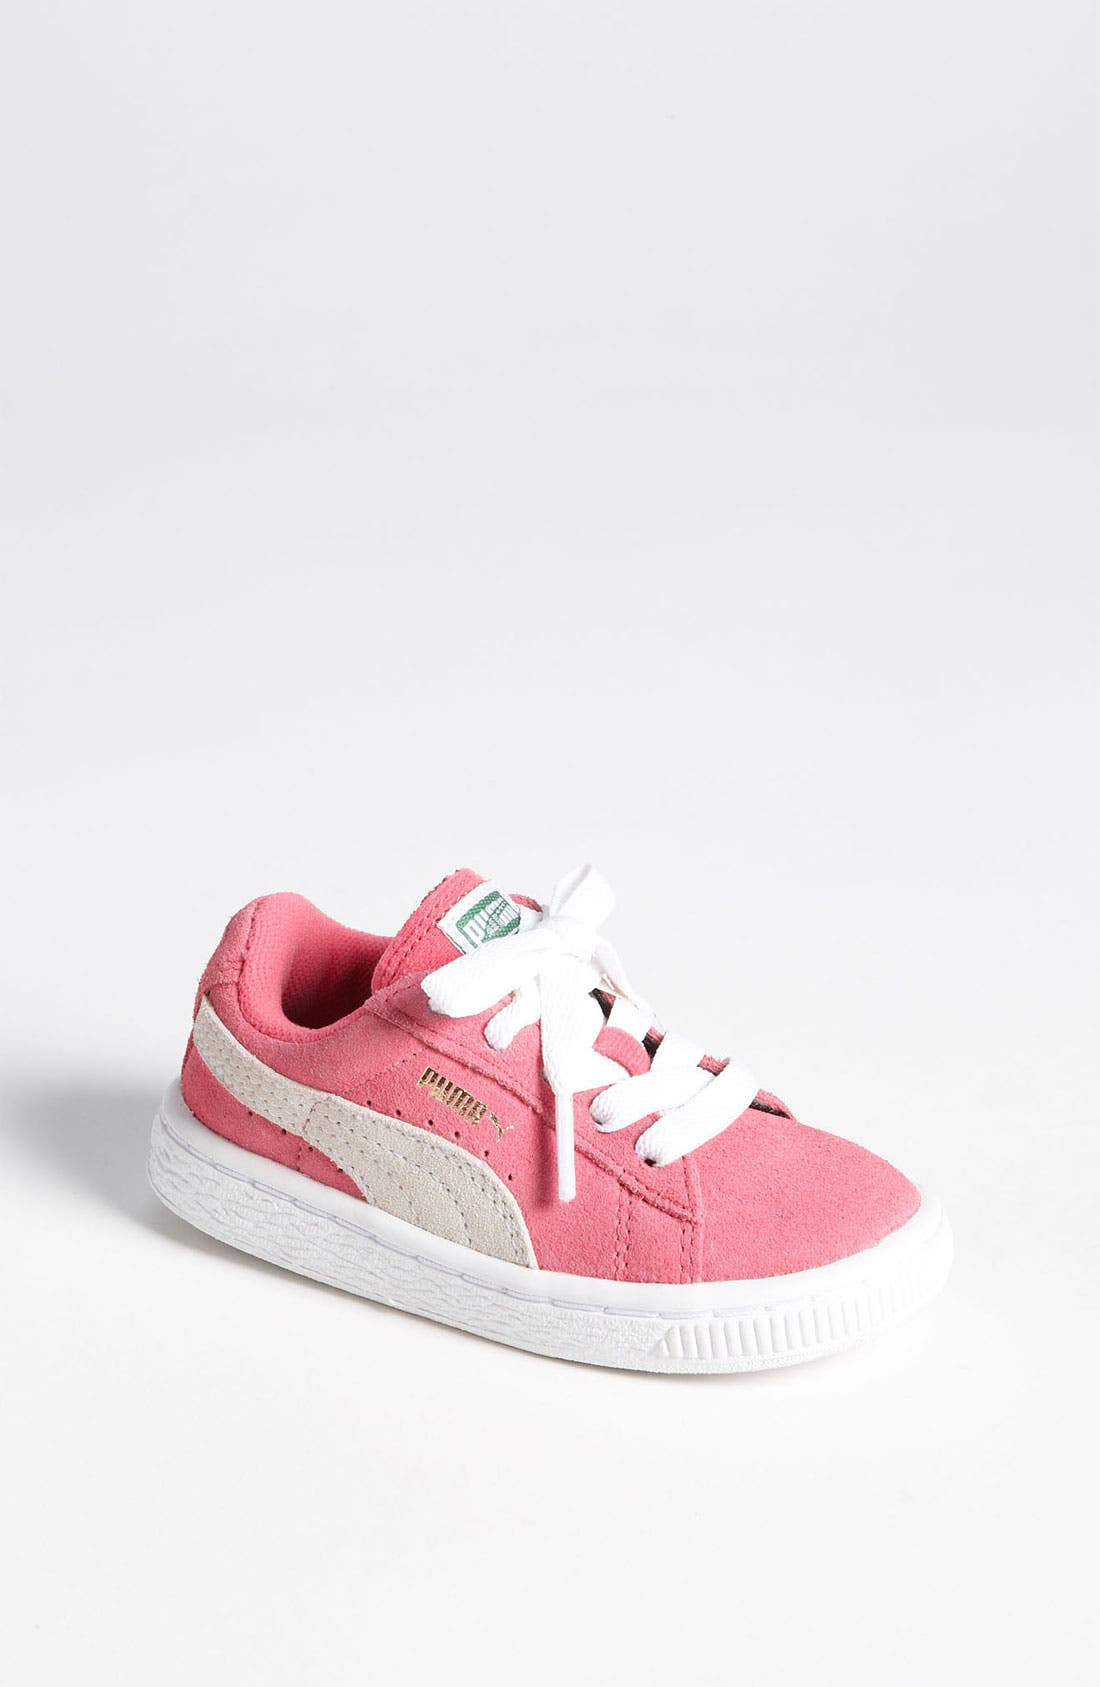 Main Image - PUMA 'Suede Classic' Sneaker (Baby, Walker, Toddler, Little Kid & Big Kid)